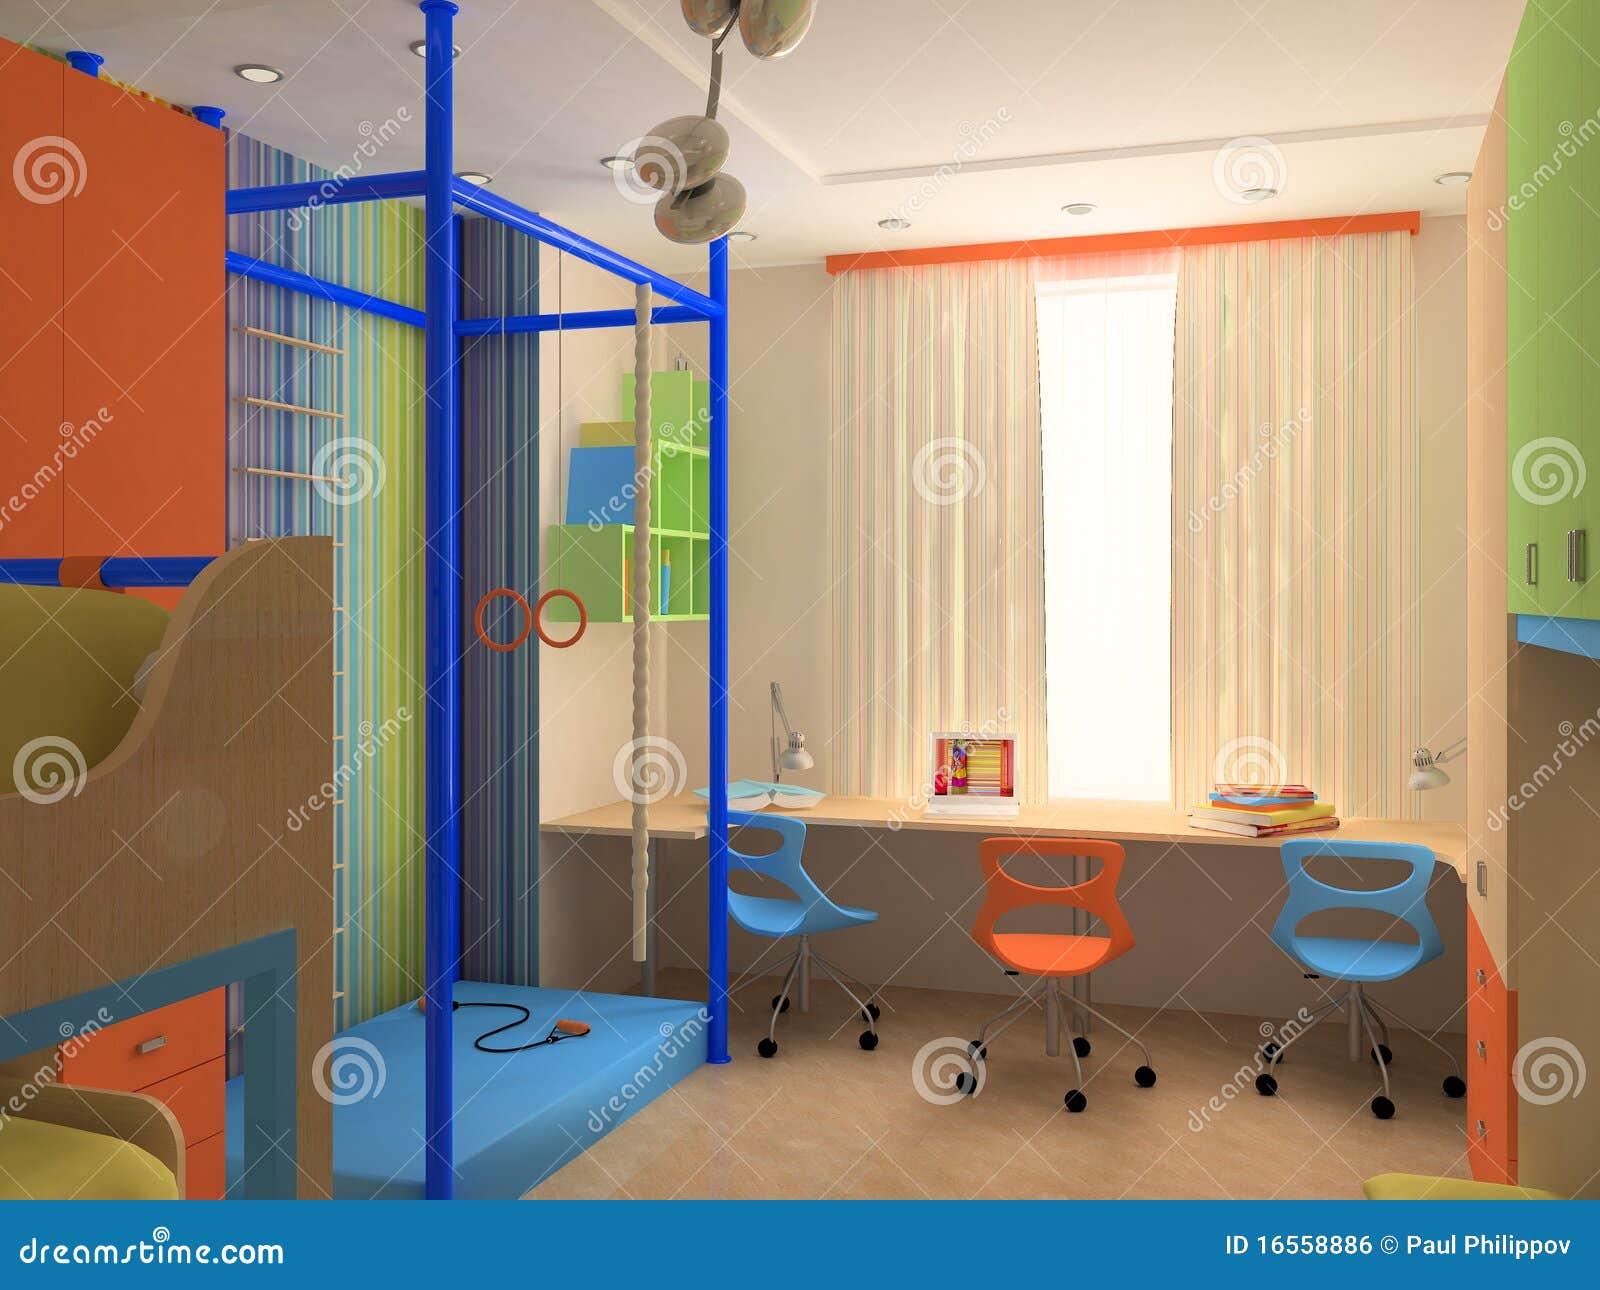 Corner of child s bedroom with colorful furniture royalty free stock image image 16558886 - Pastel slaapkamer kind ...